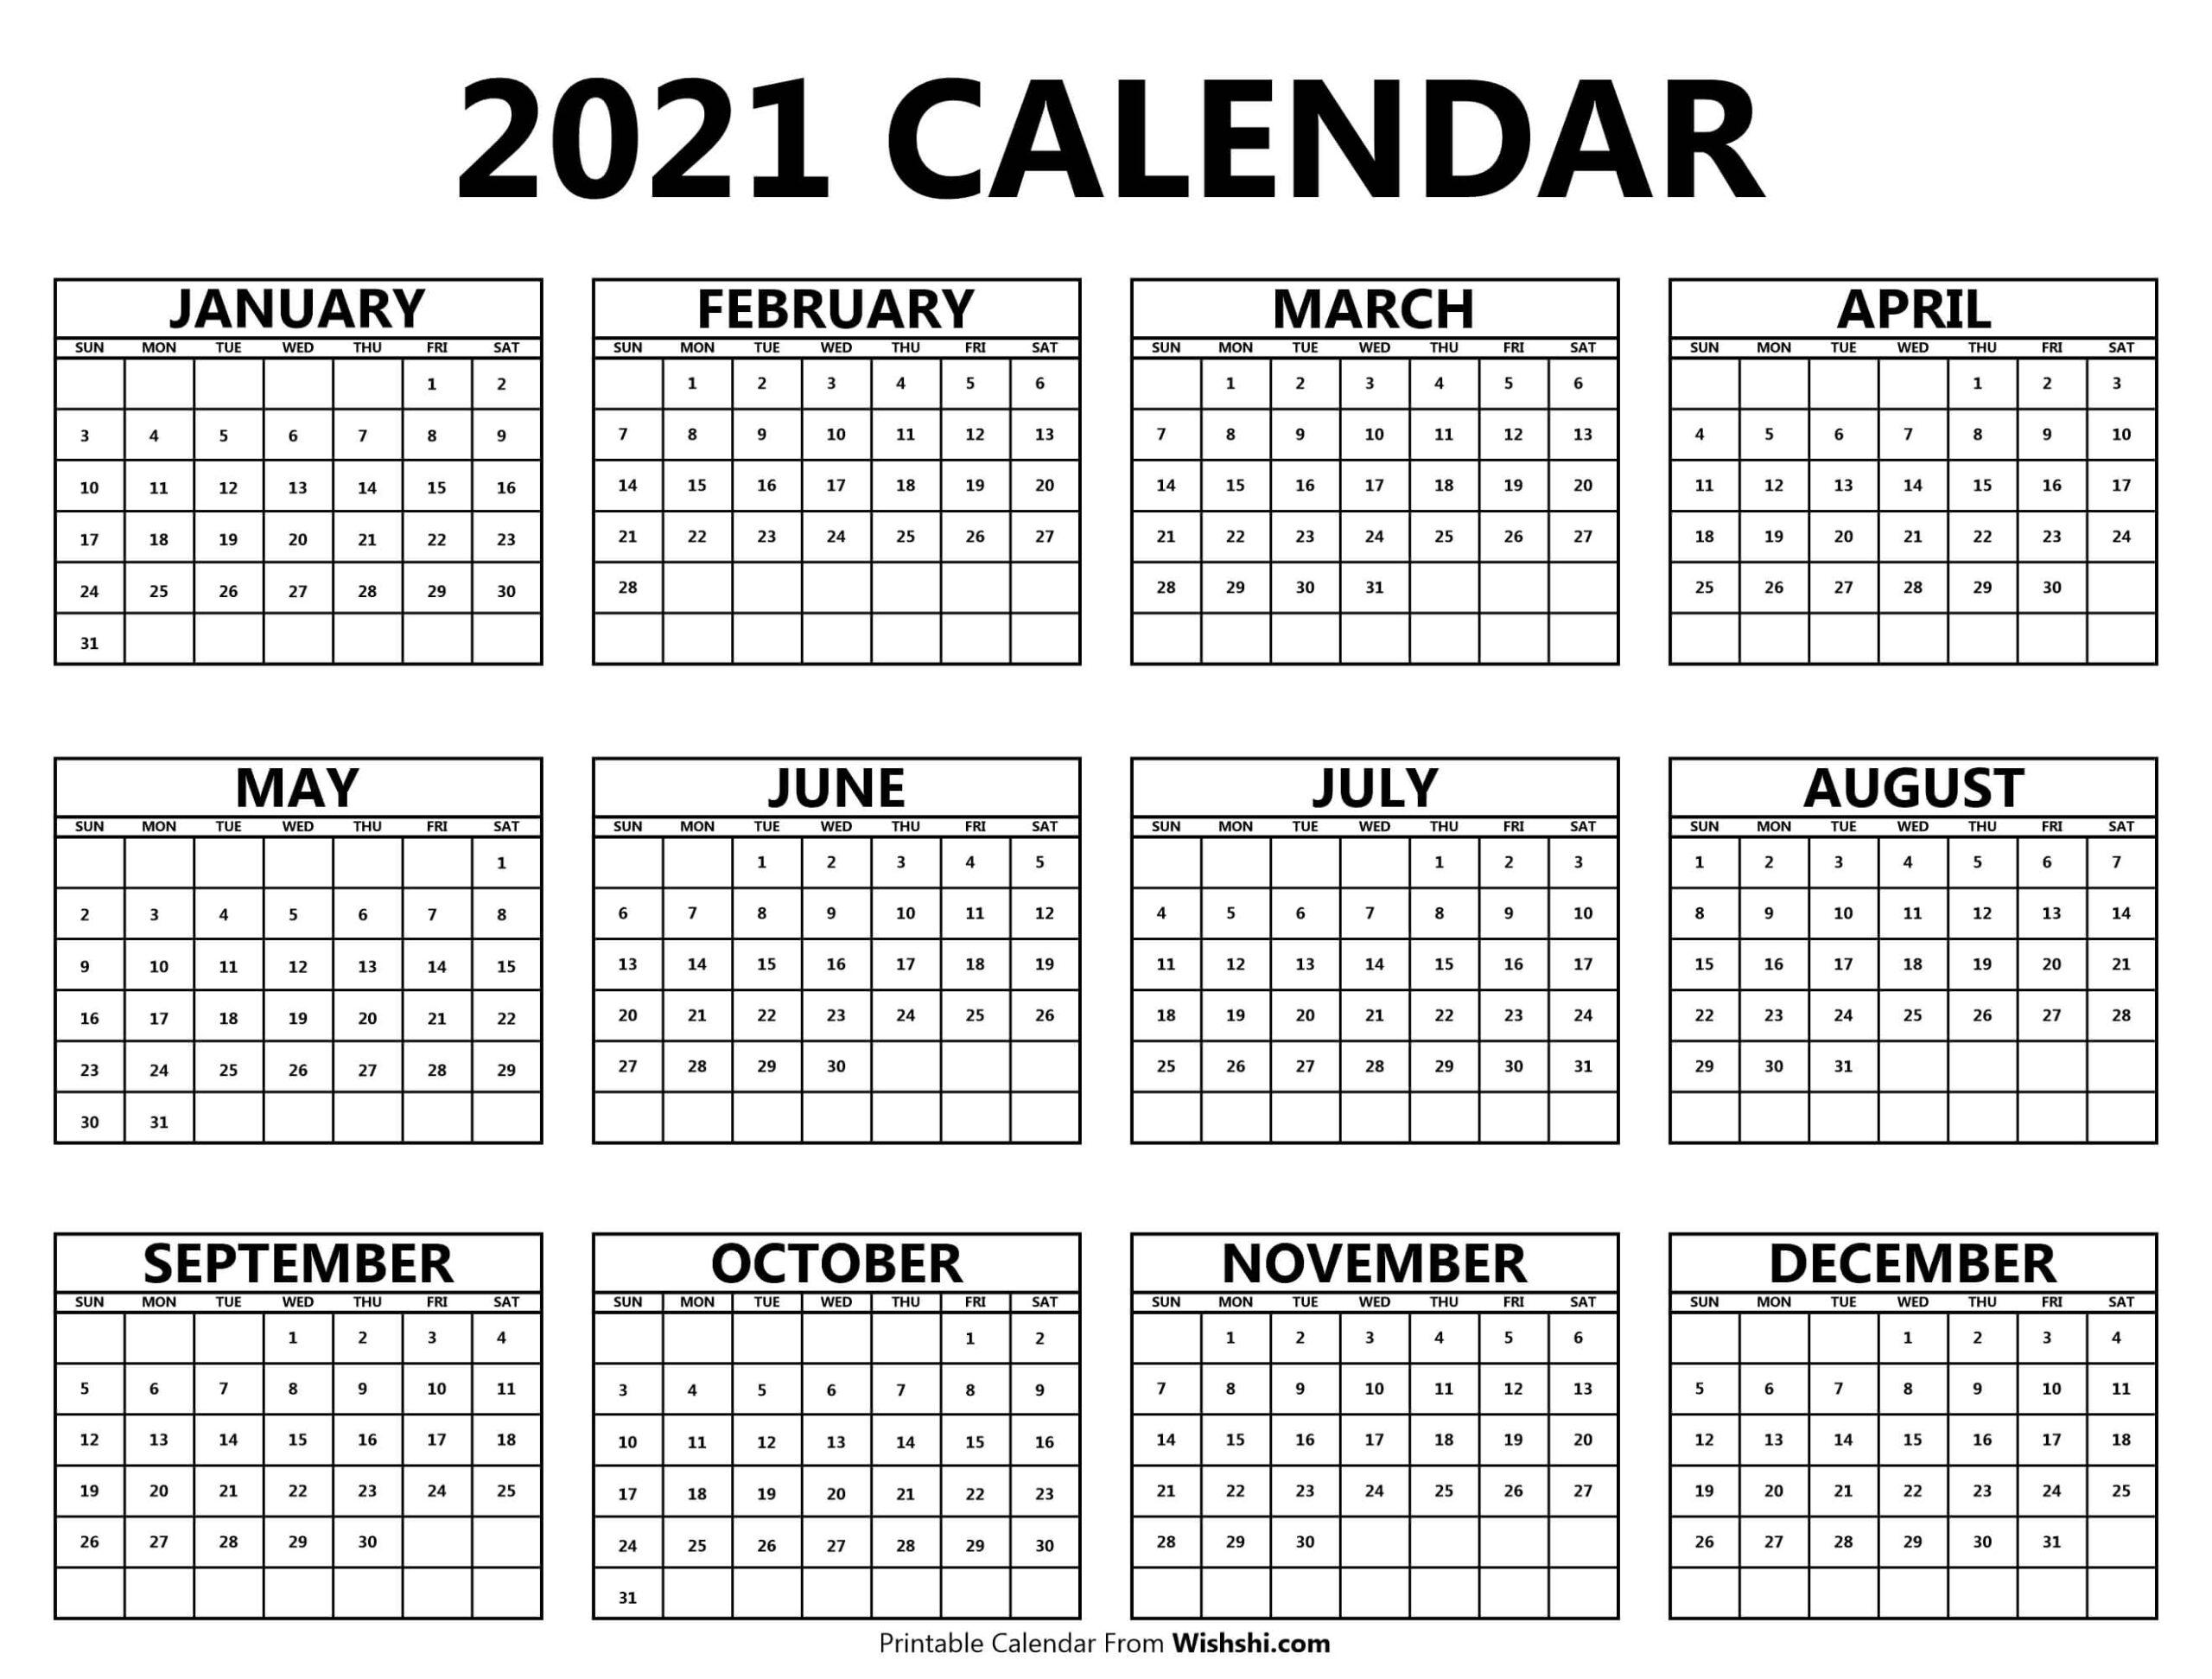 Printable 2021 Yearly Calendar - Free Printable Calendars